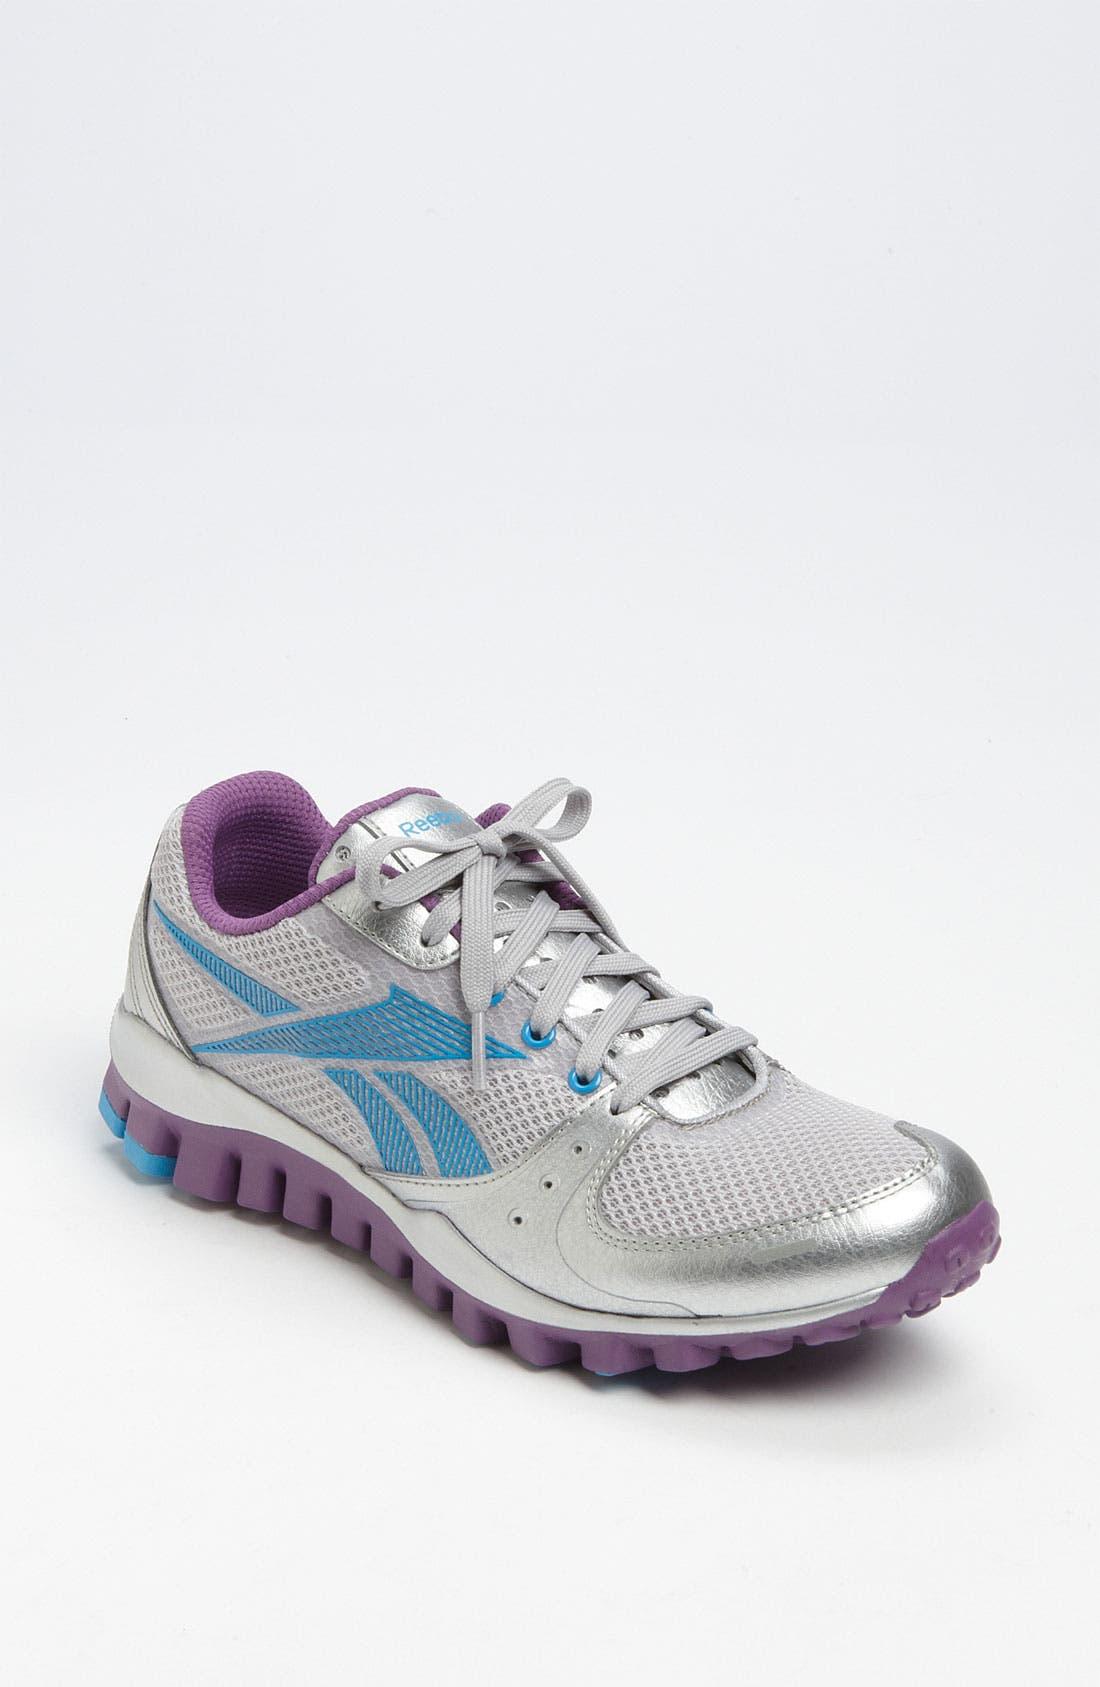 Alternate Image 1 Selected - Reebok 'RealFlex Transition' Training Shoe (Women)